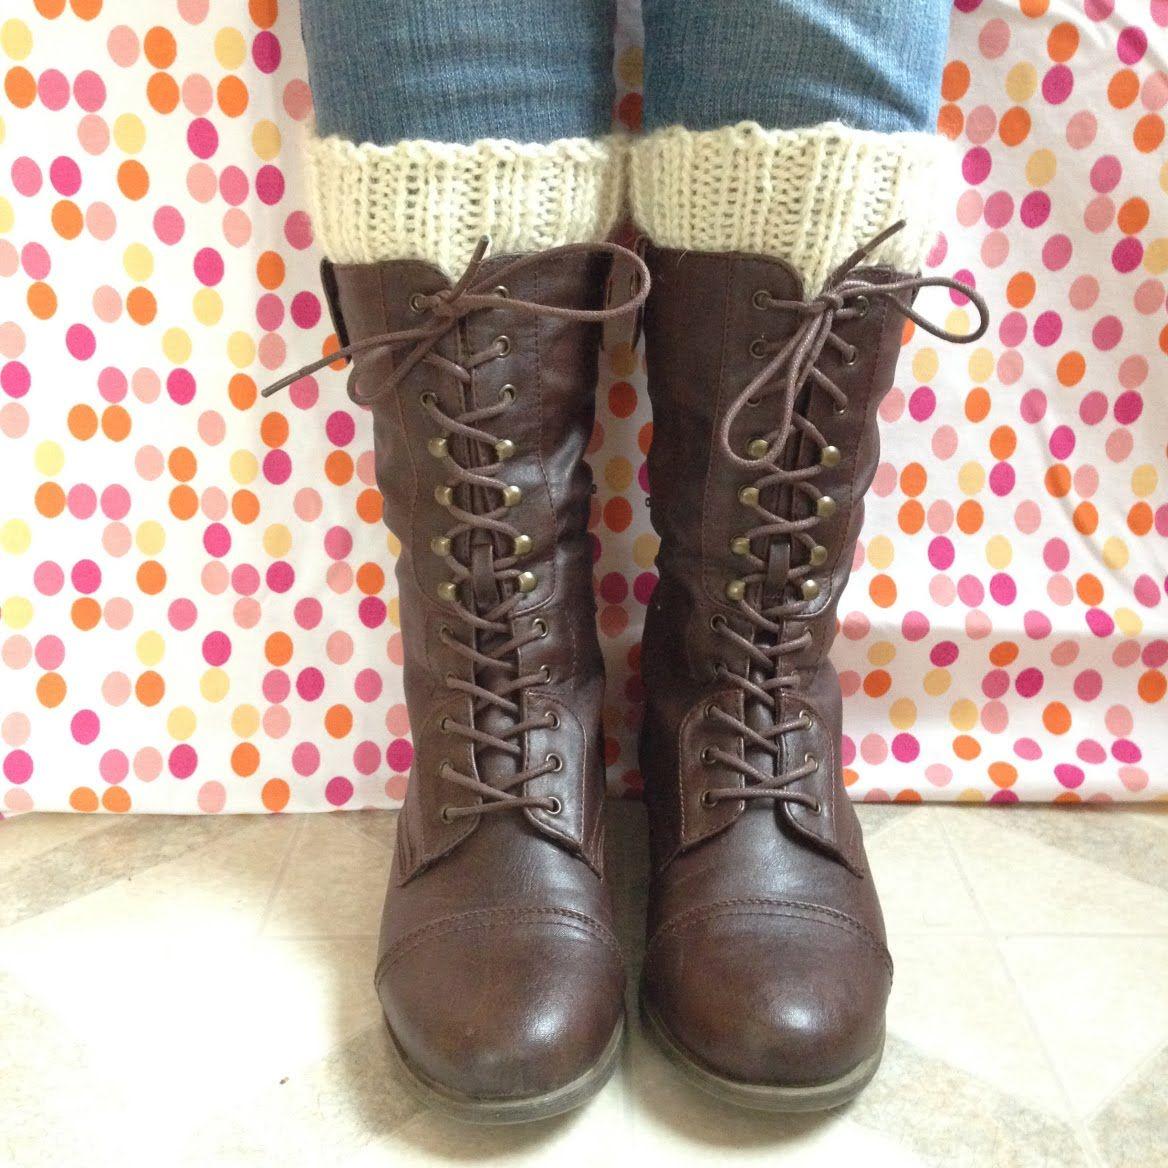 Simple Knitted Boot Cuffs from Alaska Knit Nat | knitting/crochet ...